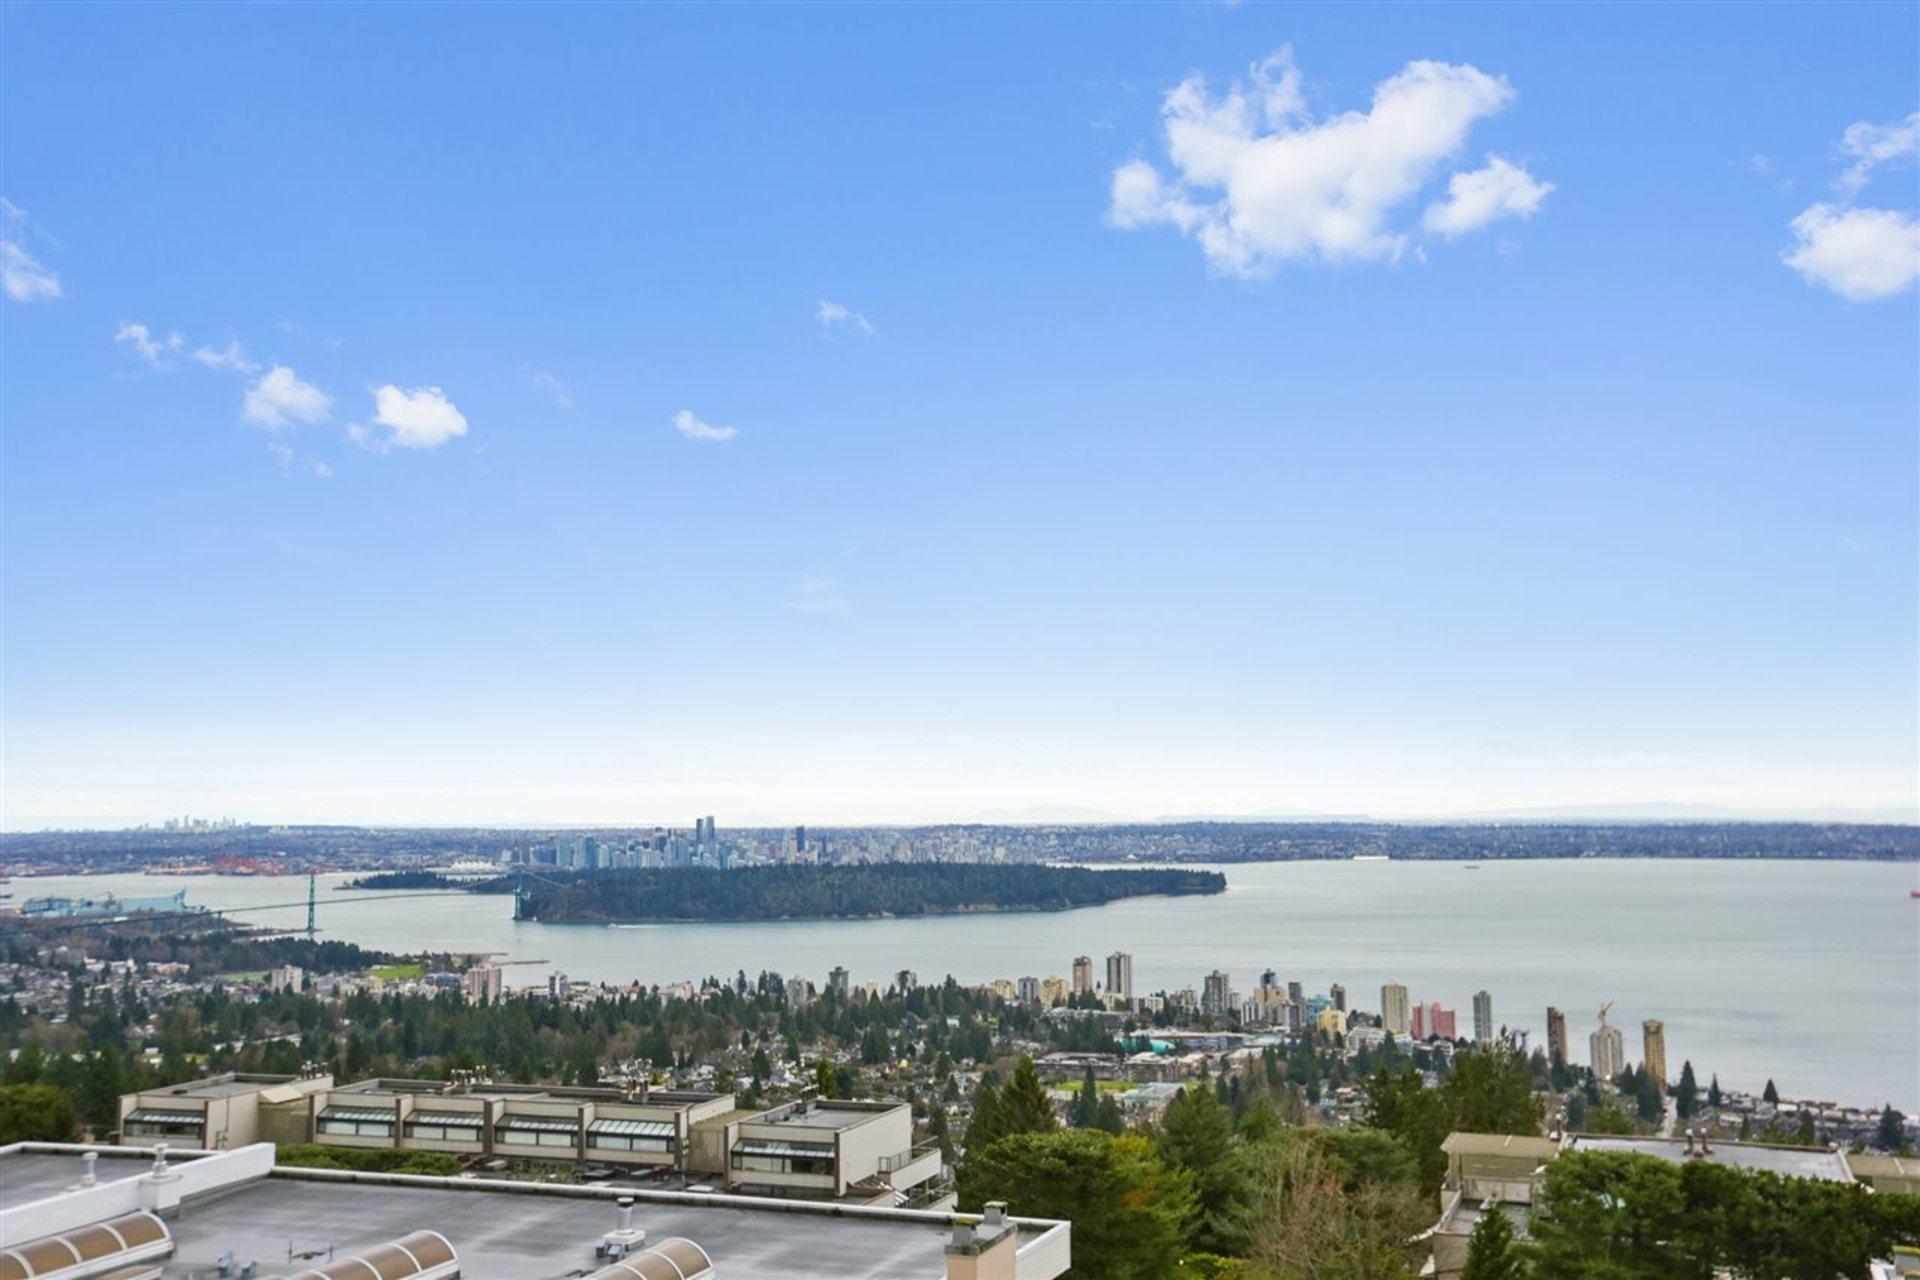 2274-folkestone-way-panorama-village-west-vancouver-01 at 208 - 2274 Folkestone Way, Panorama Village, West Vancouver